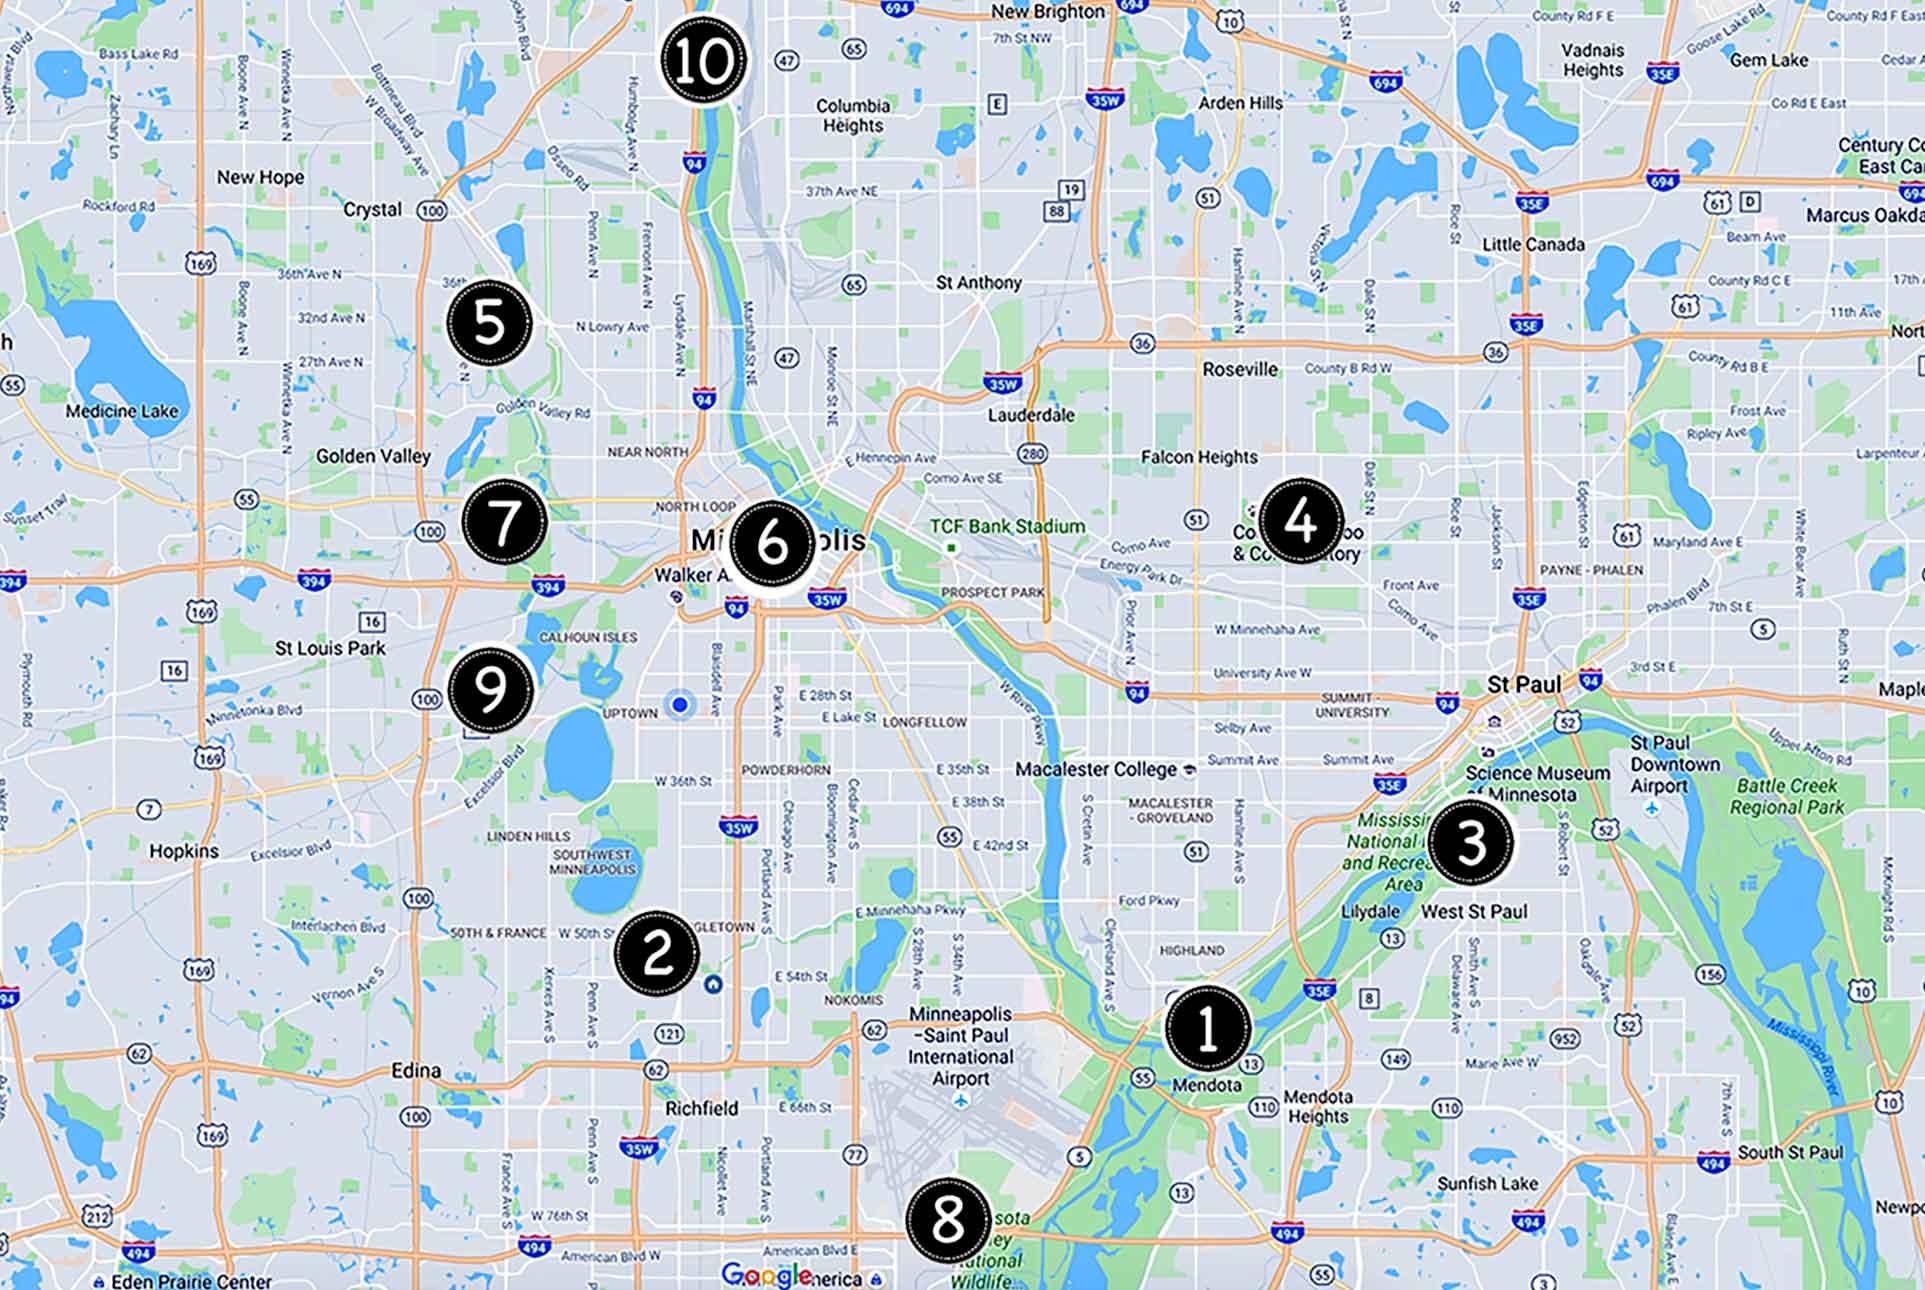 Twin Cities adventure map